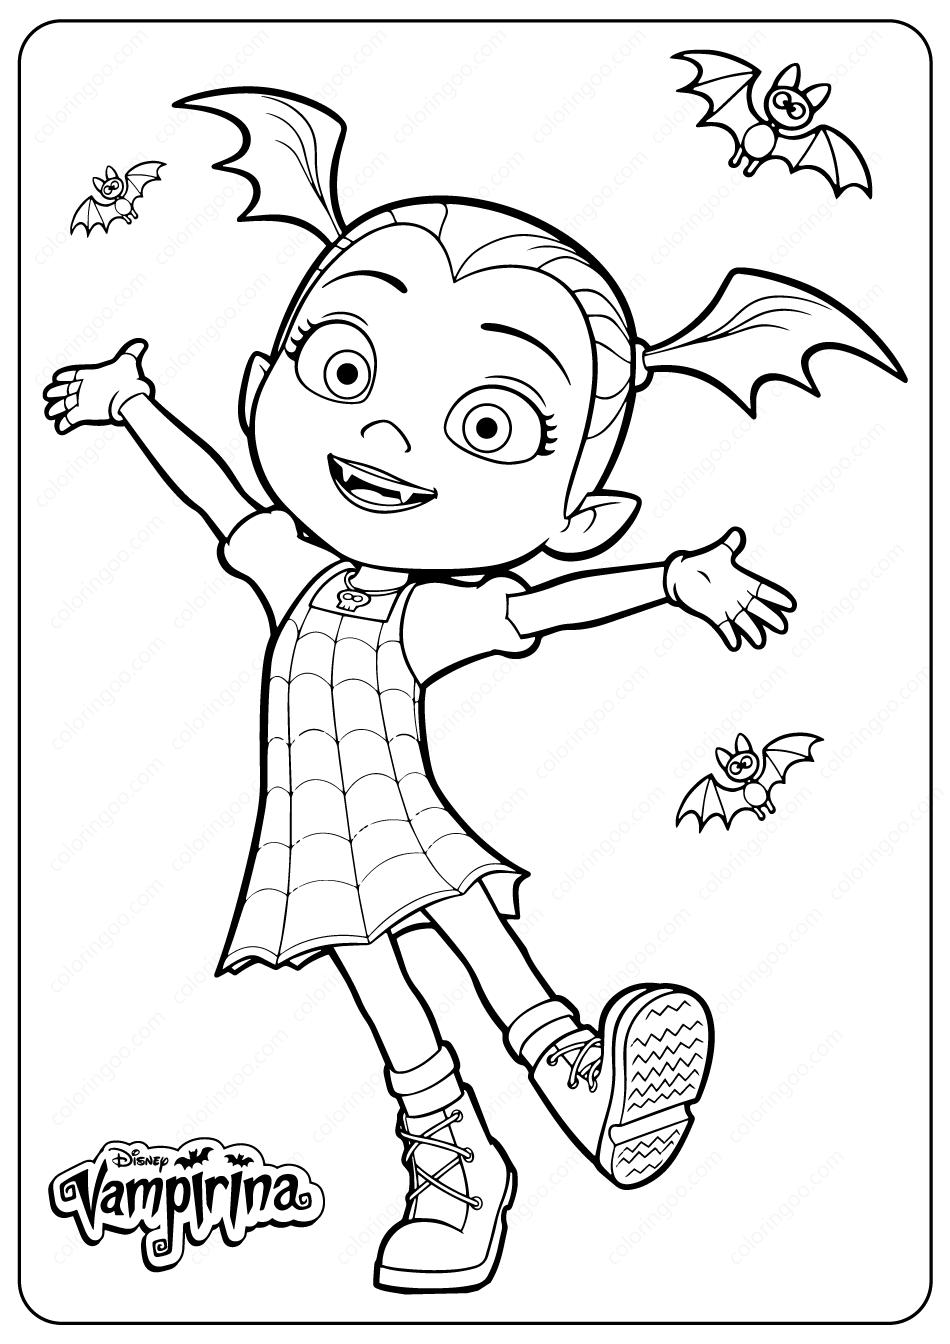 Printable Disney Junior Vampirina Coloring Pages